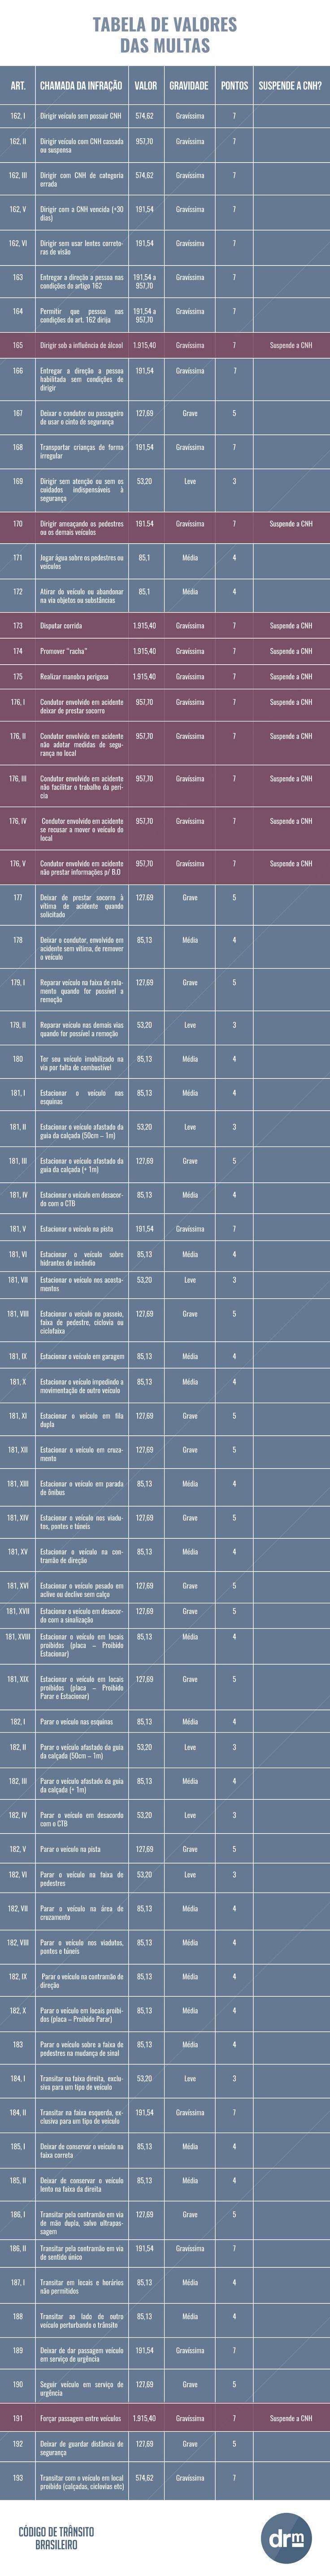 novos valores de multas parte 1